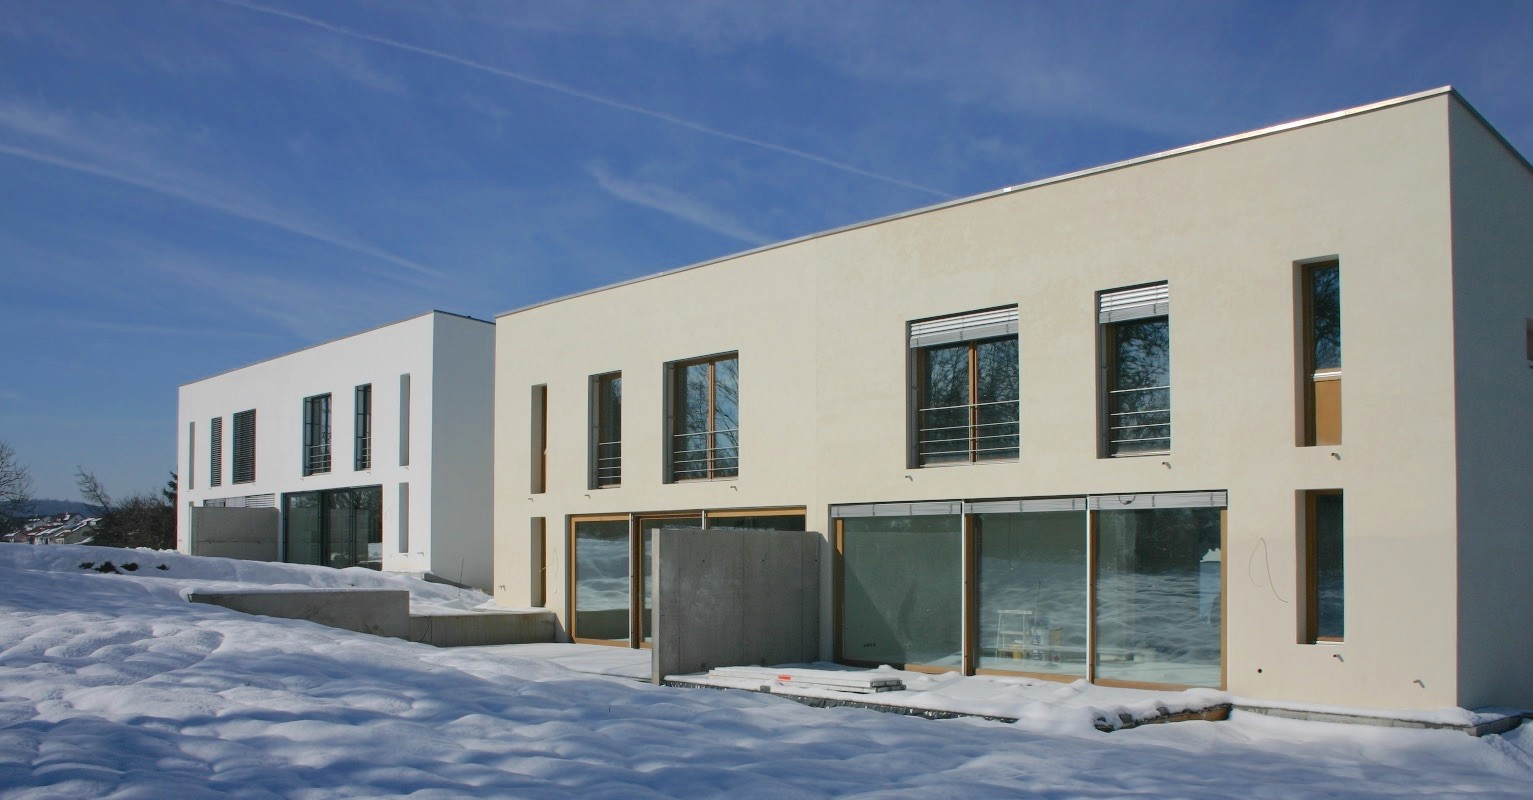 2 x 2 doppelhaush lften schatthausen bauwerk bau reilingen. Black Bedroom Furniture Sets. Home Design Ideas